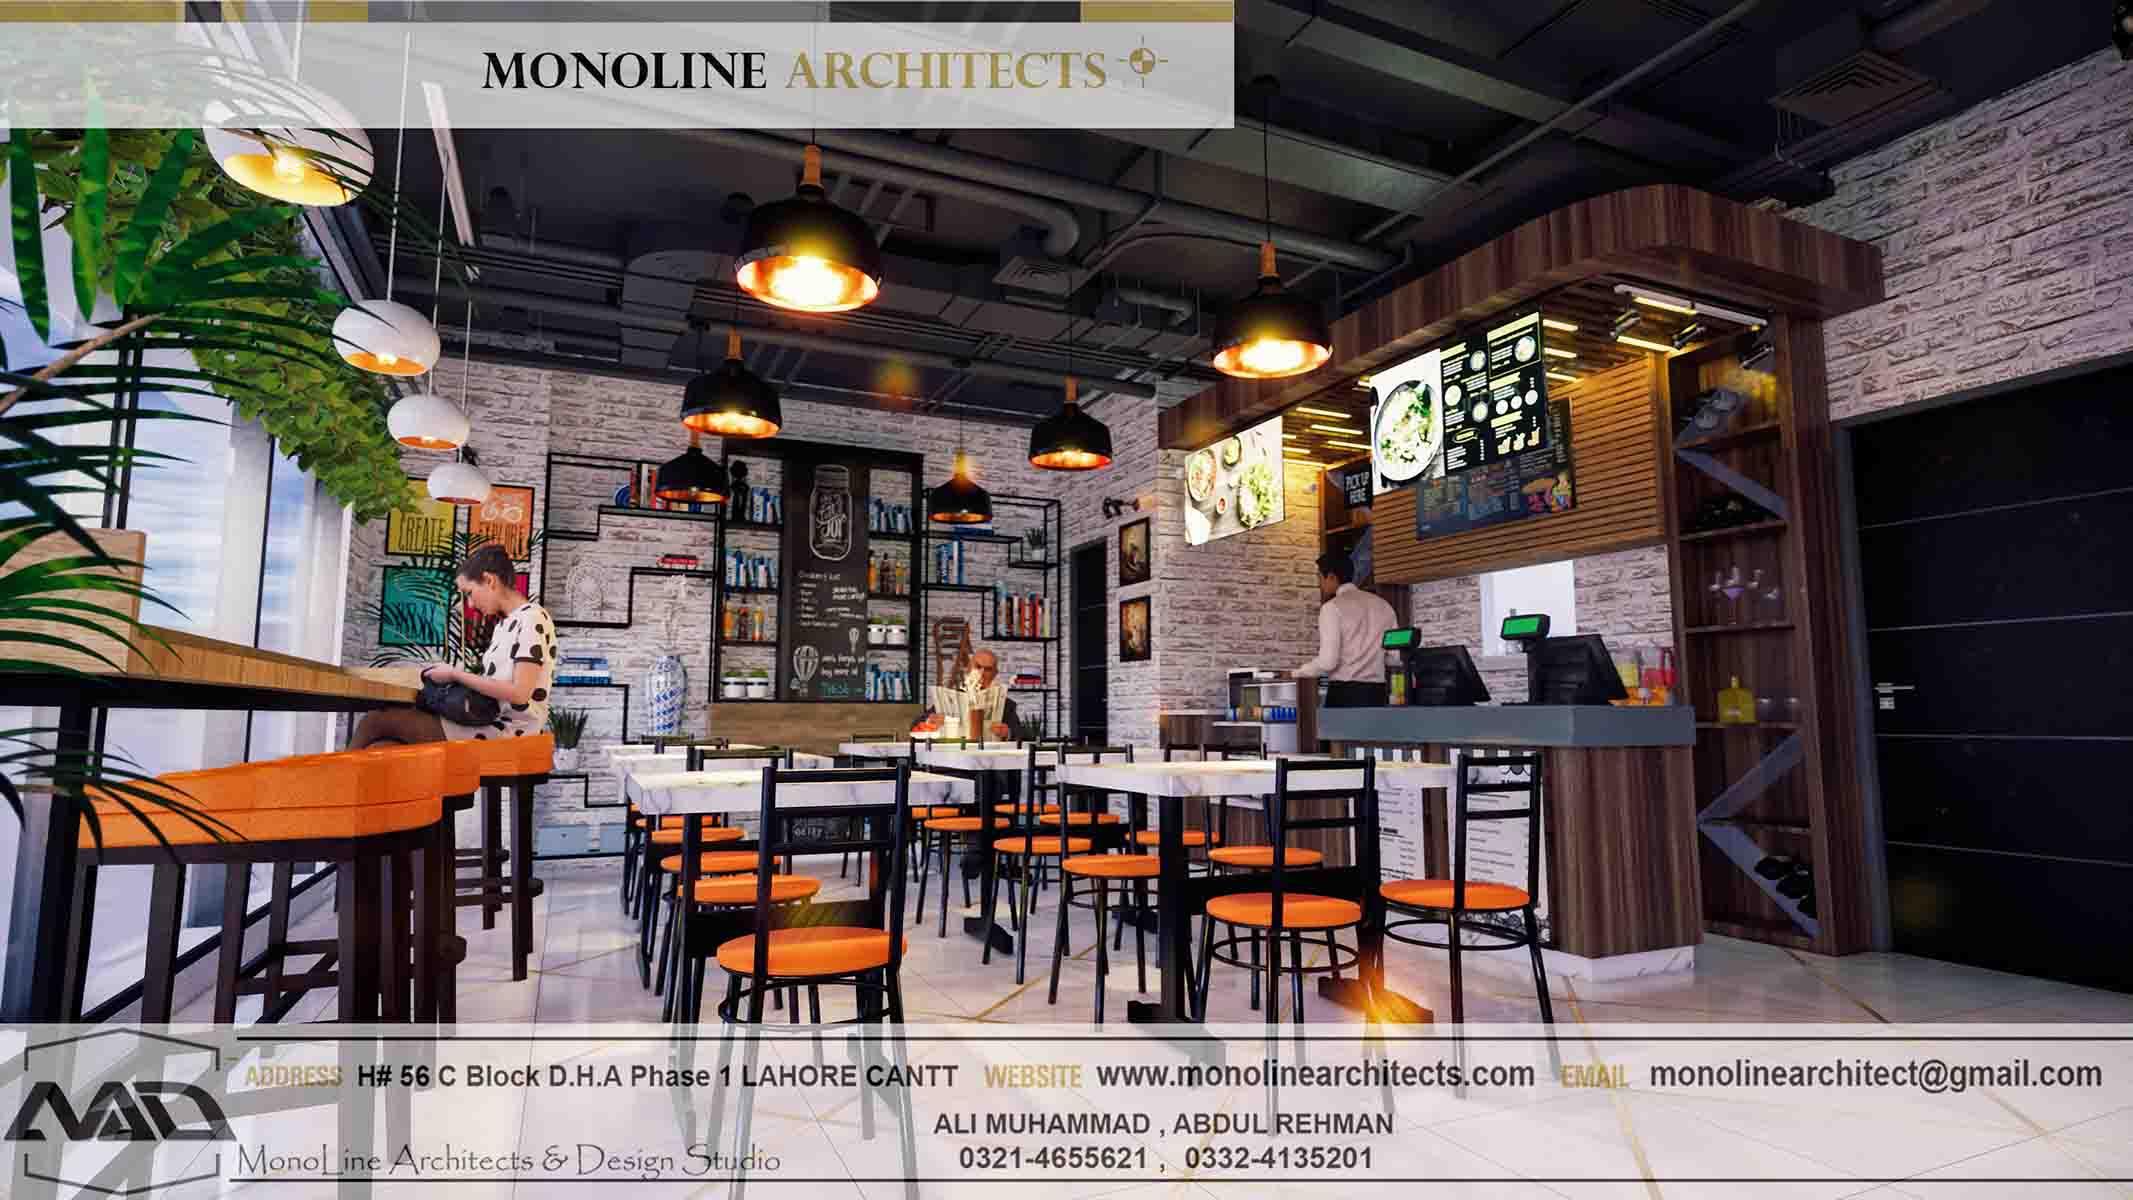 Dubai Cafe 9 by monoline architects